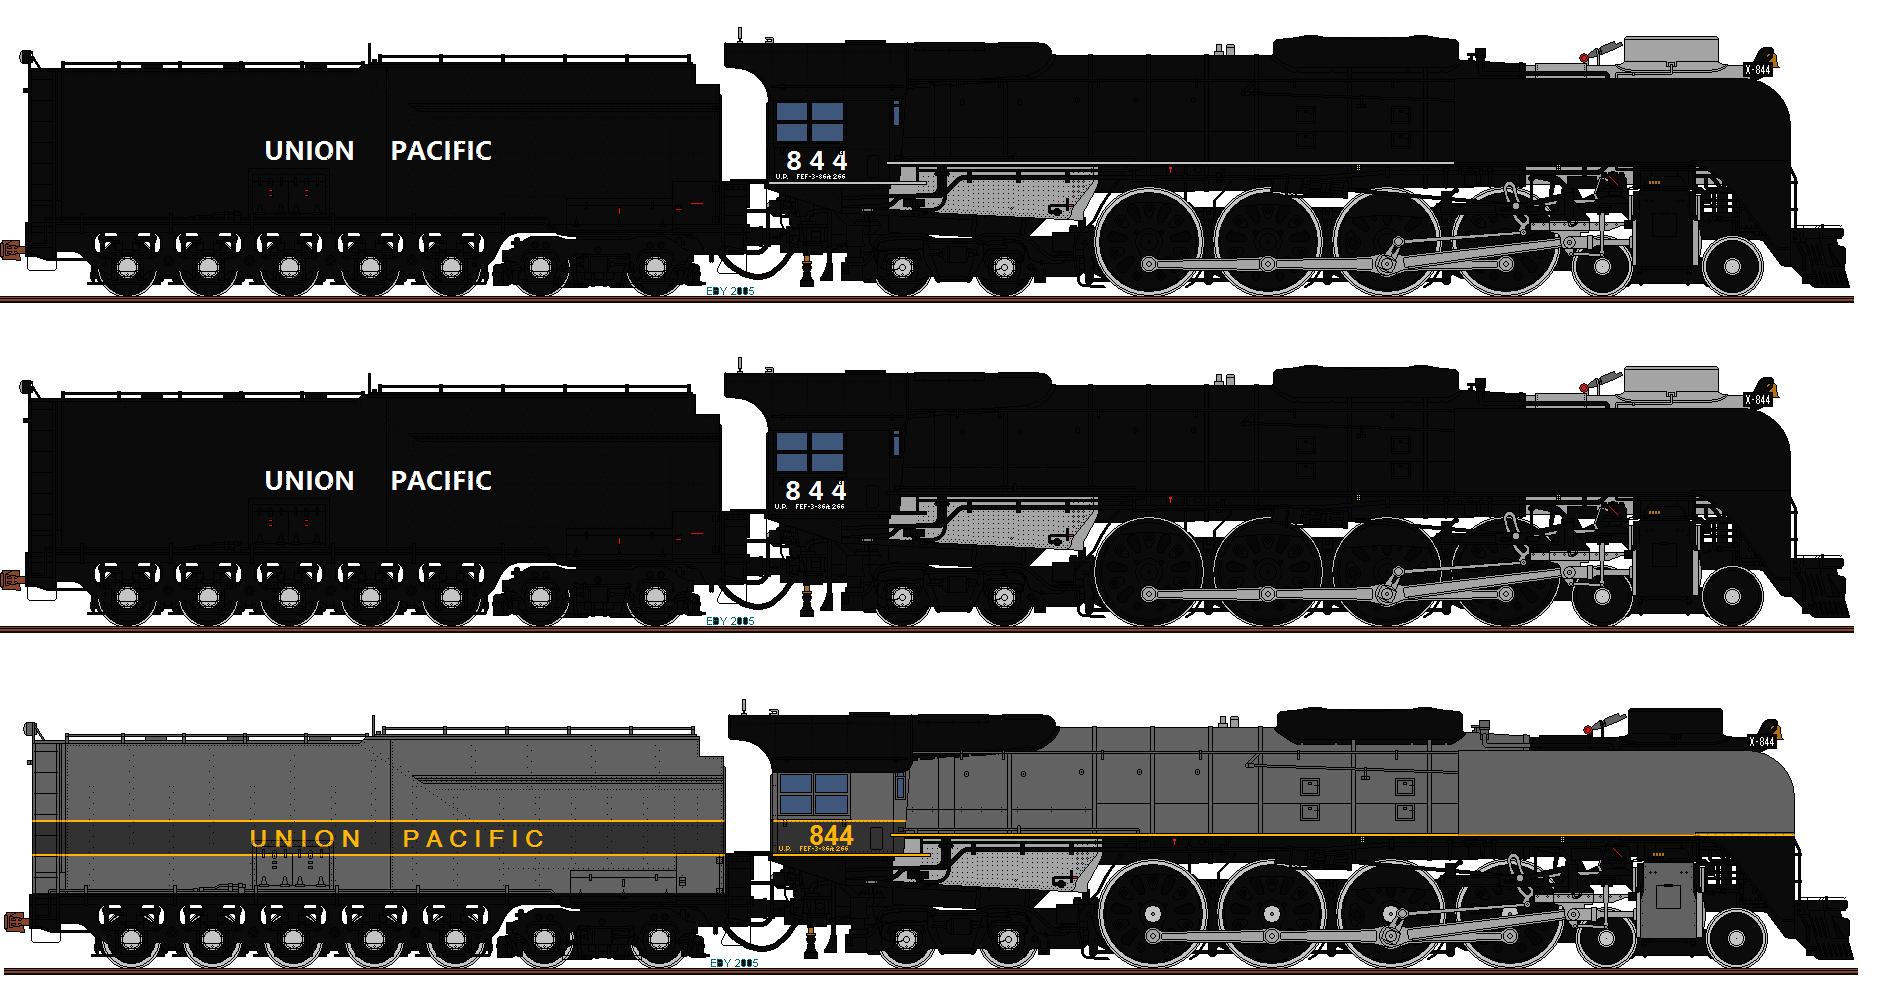 Drawn railroad union pacific train DeviantArt on by o484 Union